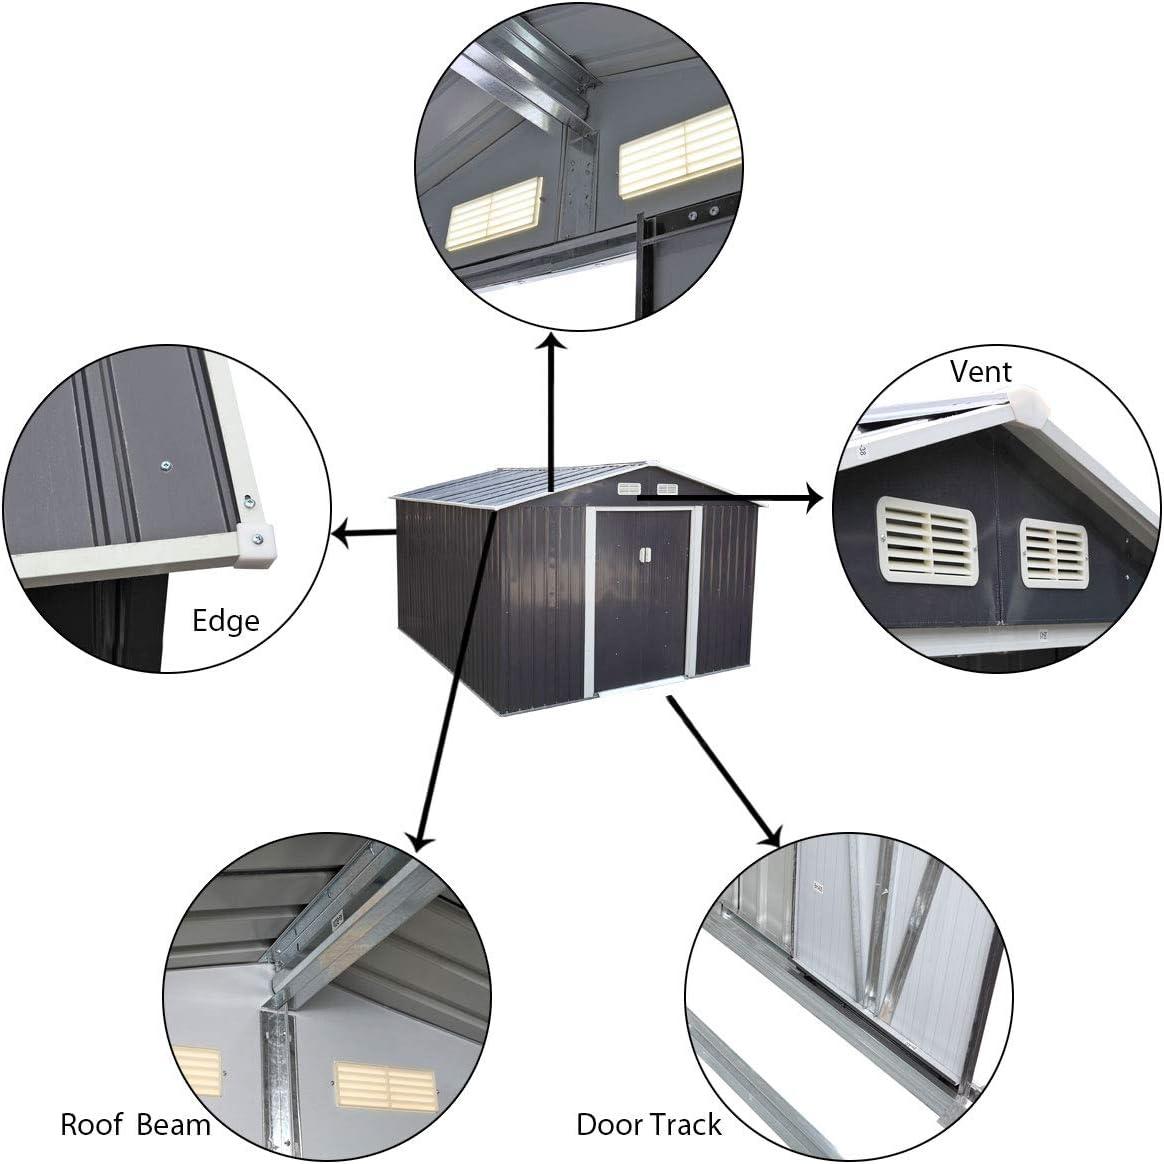 Dark Gray Lockable Sliding Door Rural Style Gable Roof JAXSUNNY 4.2 x 7 Outdoor Backyard Garden Patio Metal Storage Shed with Floor for Utility Tool Storage